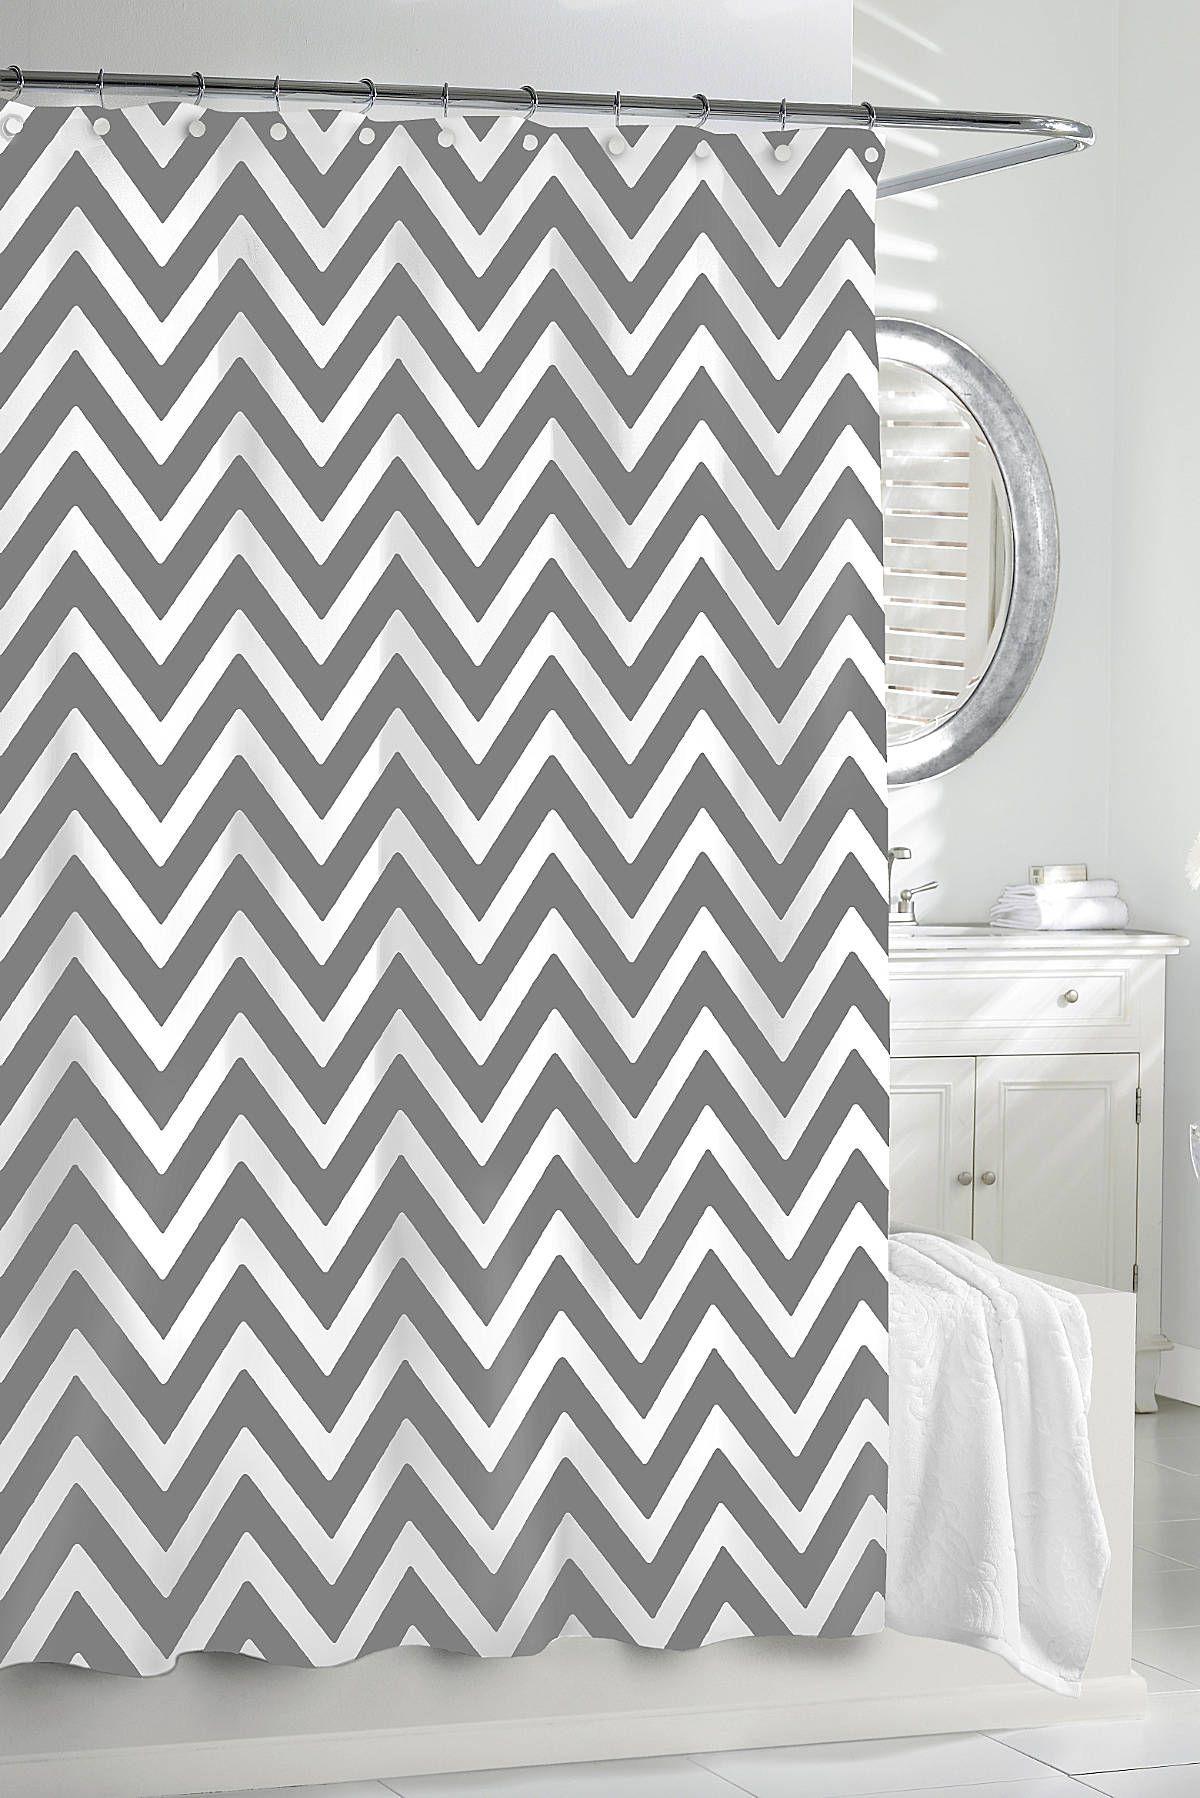 Chevron gray shower curtain - Kassatex Chevron Shower Curtain Gracious Home Project Ds